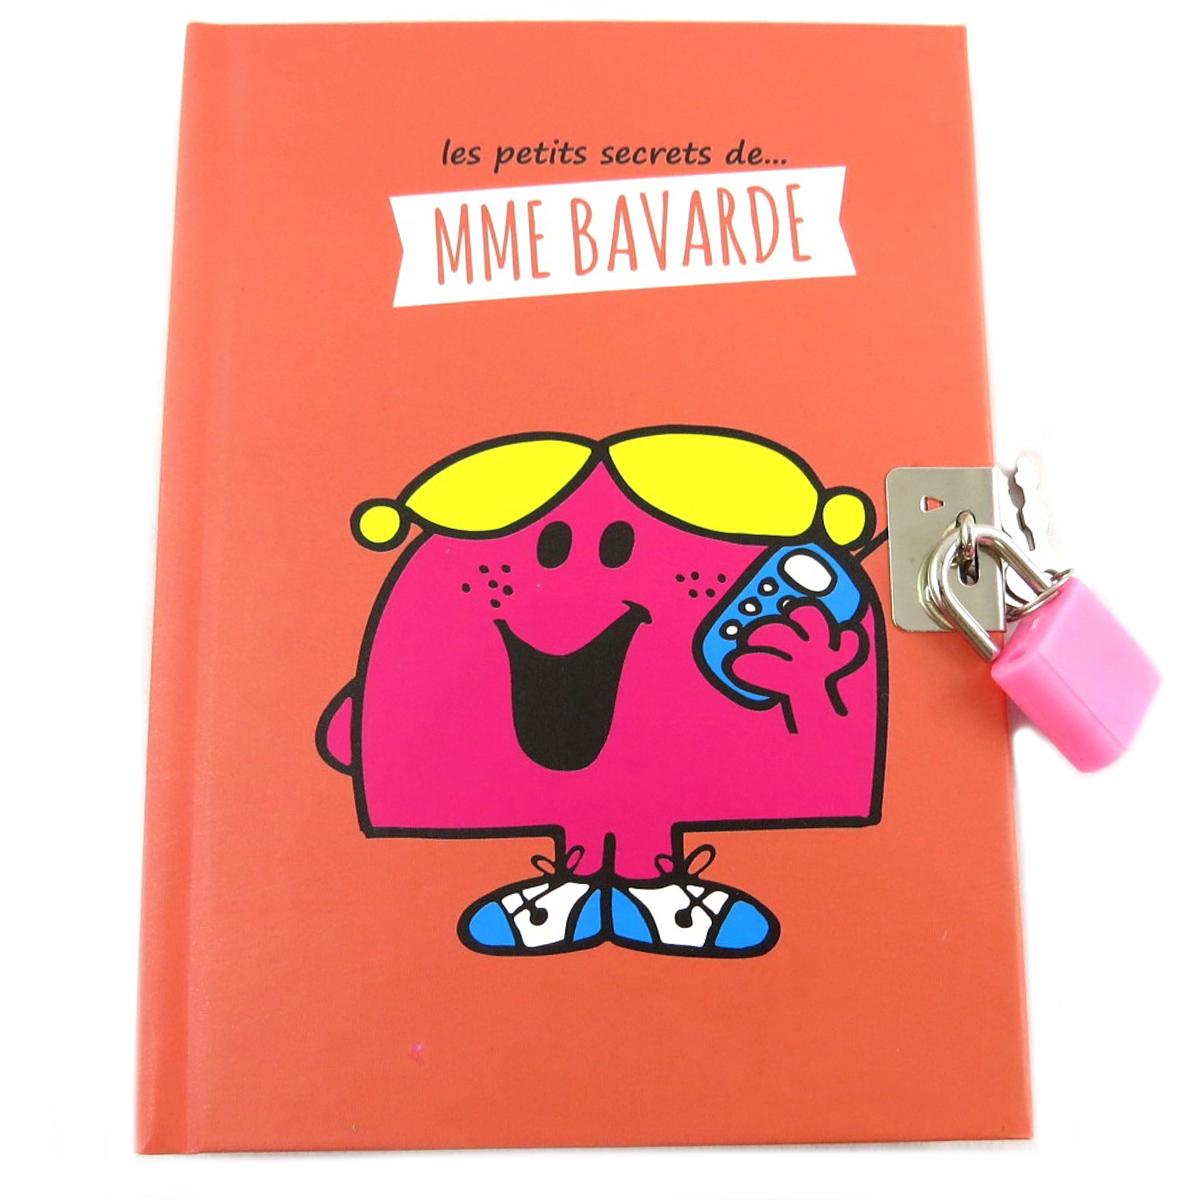 Journal Intime \'Monsieur Madame\' orange (Mme Bavarde) - 15x11 cm - [Q0621]